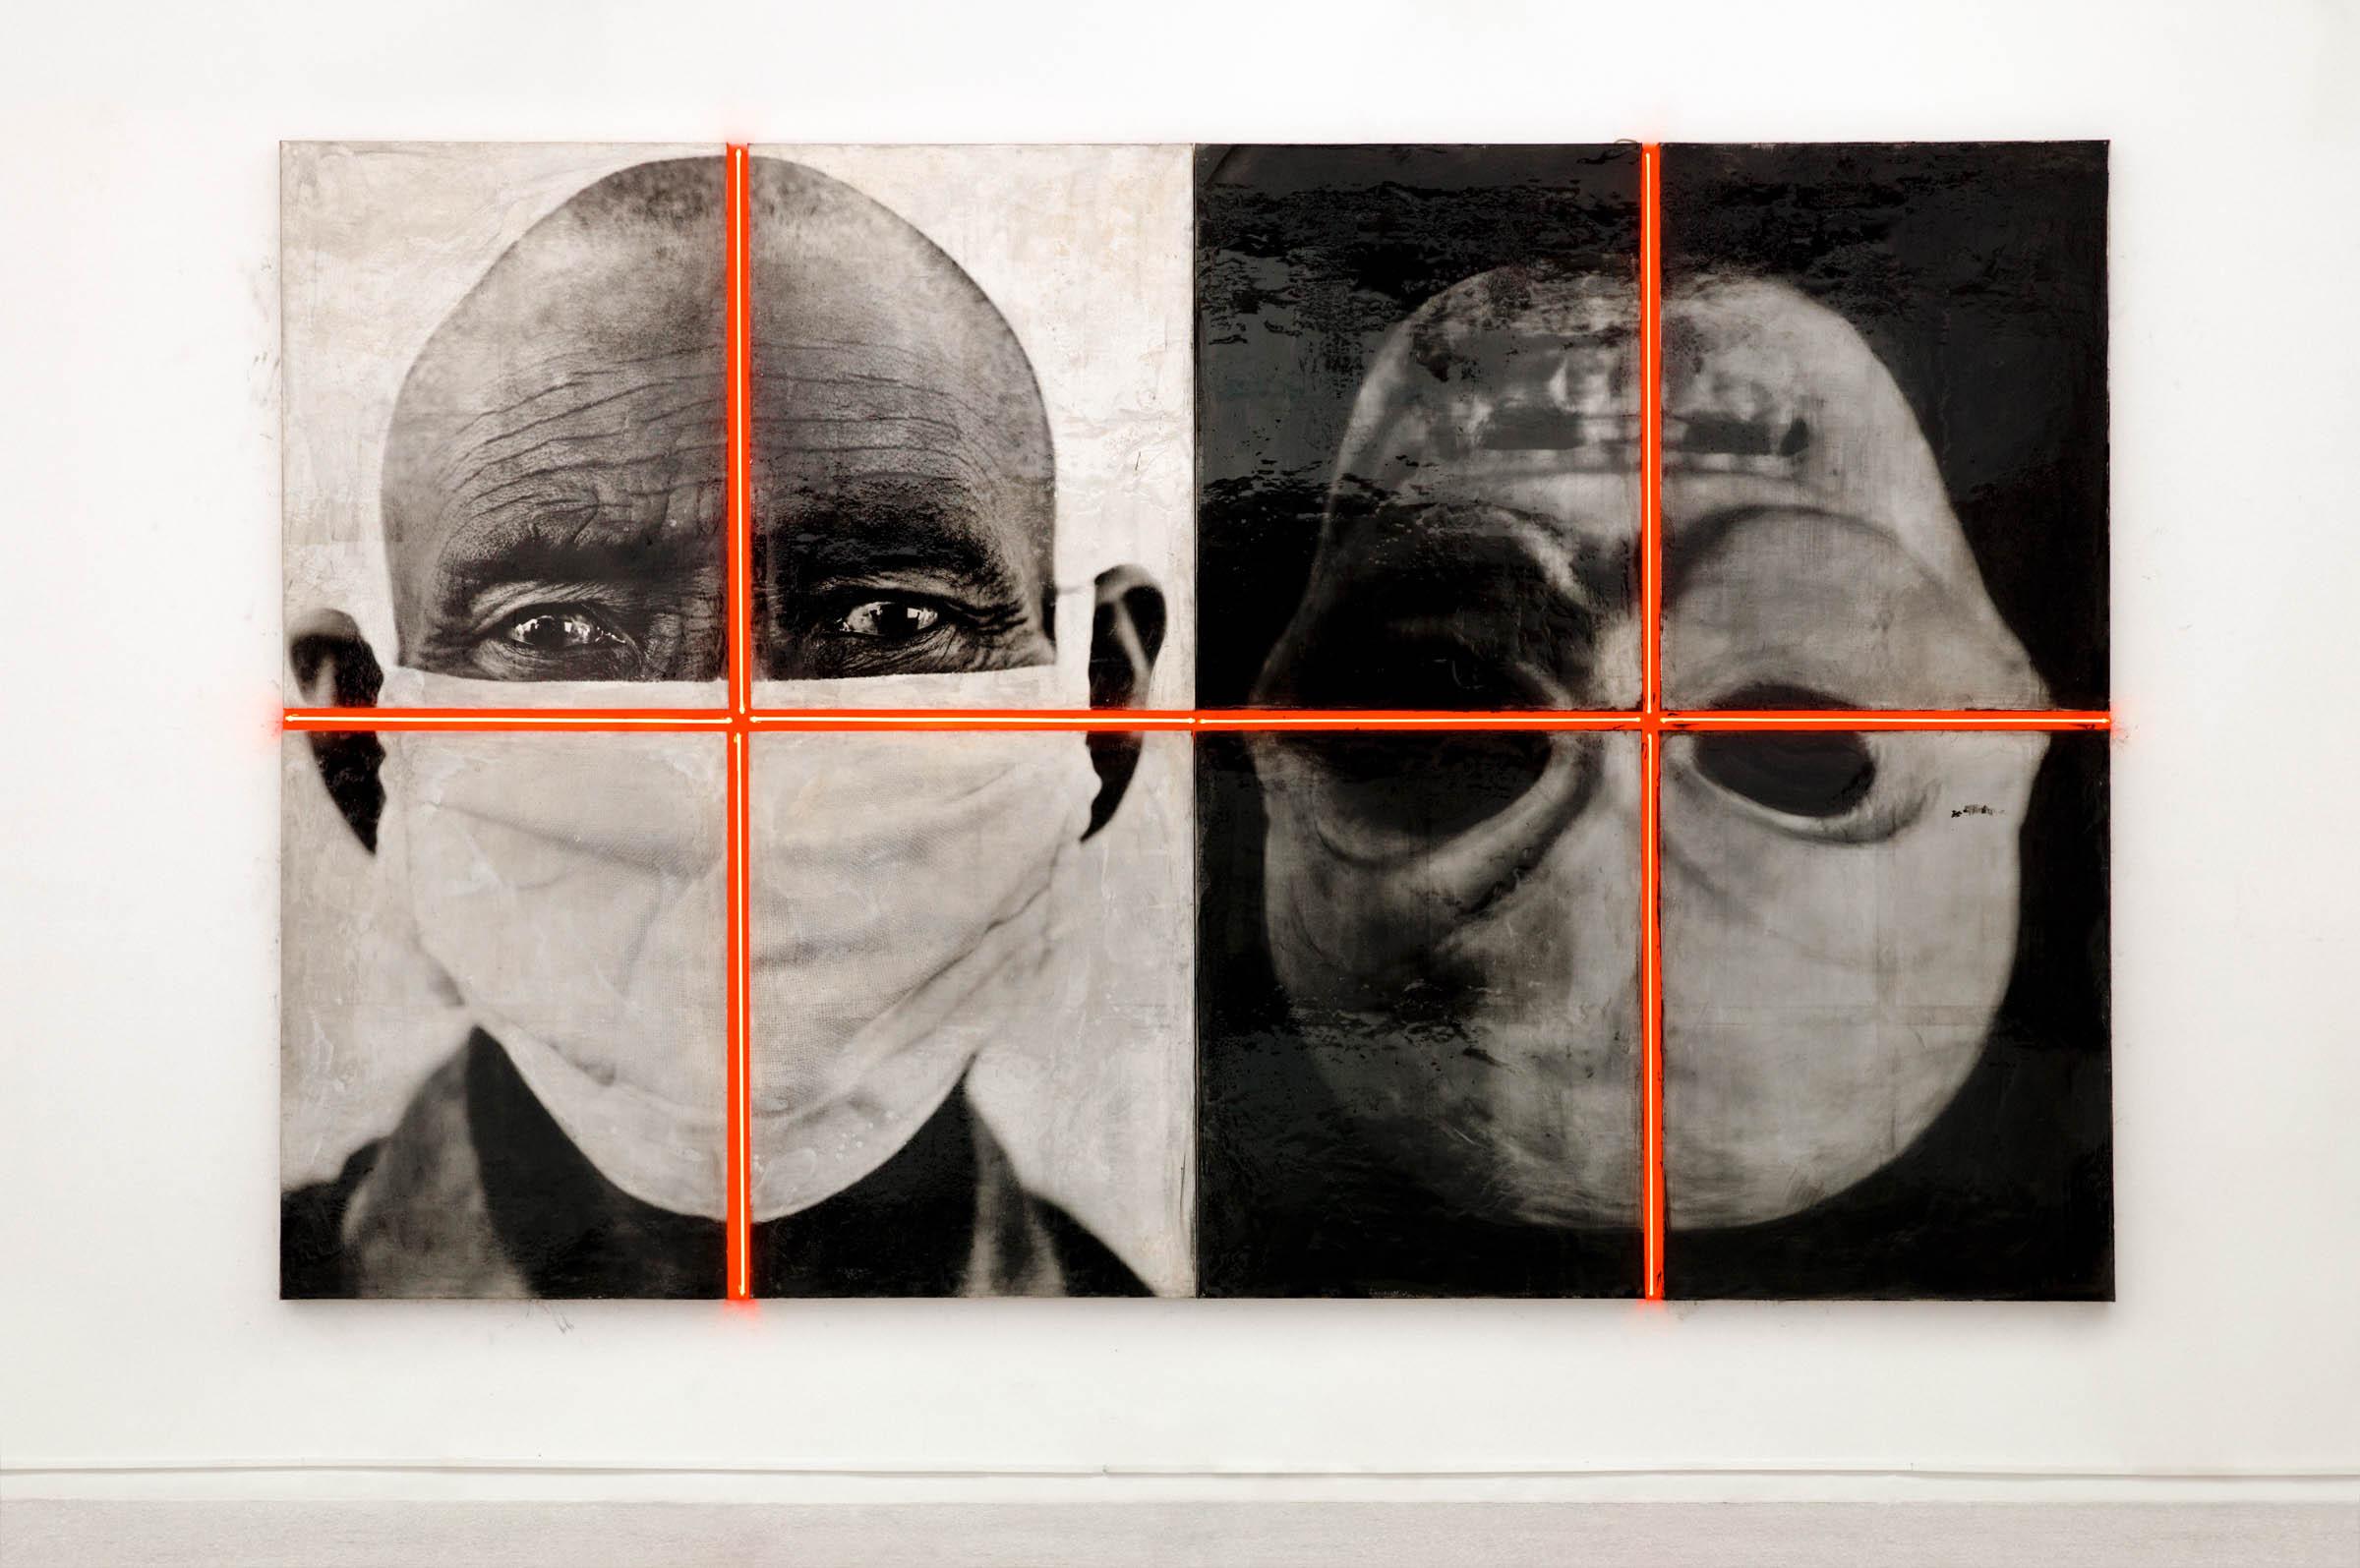 Portrait Dualité, 1995, gelatin silver print on acid-free paper and fabric © BoSTUDIO. Photo by Ma Xiaochun